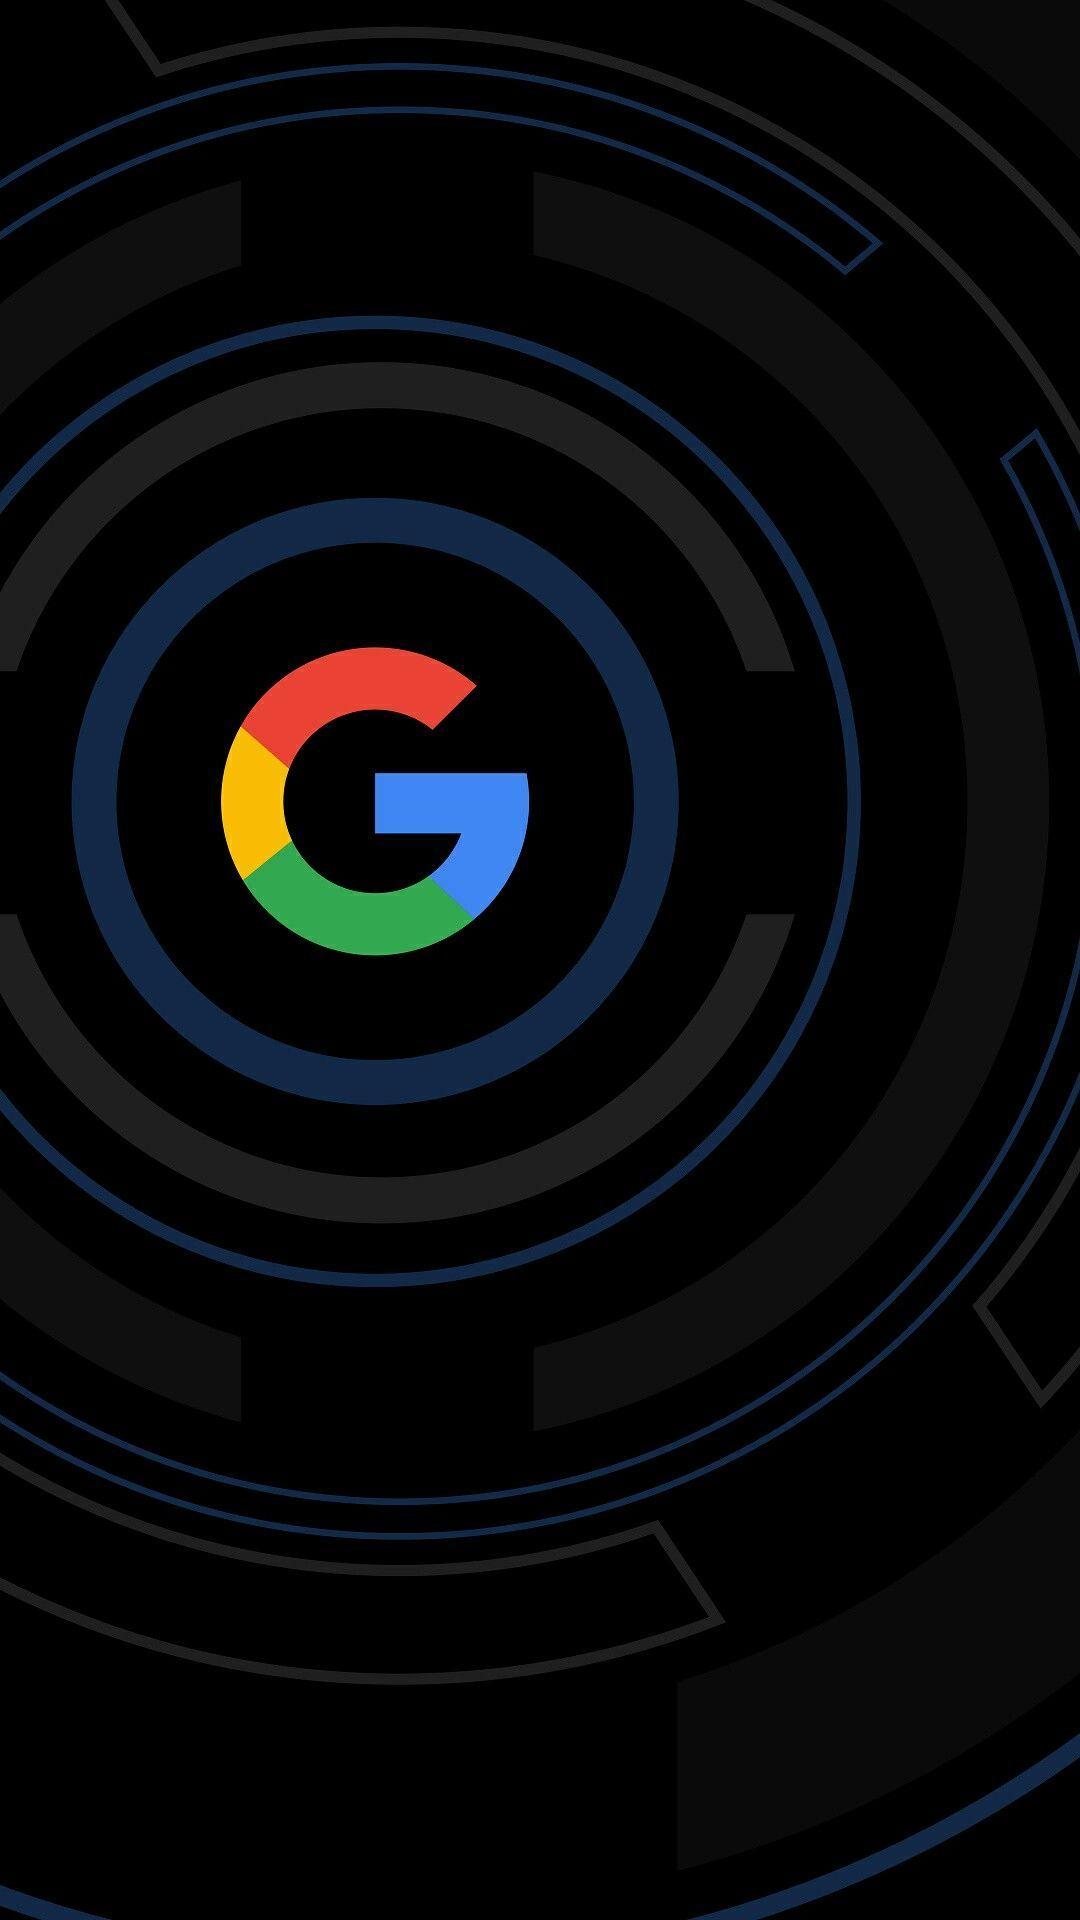 Google Wallpaper Hupages Download Iphone Wallpapers Google Pixel Wallpaper Profile Wallpaper Black Wallpaper